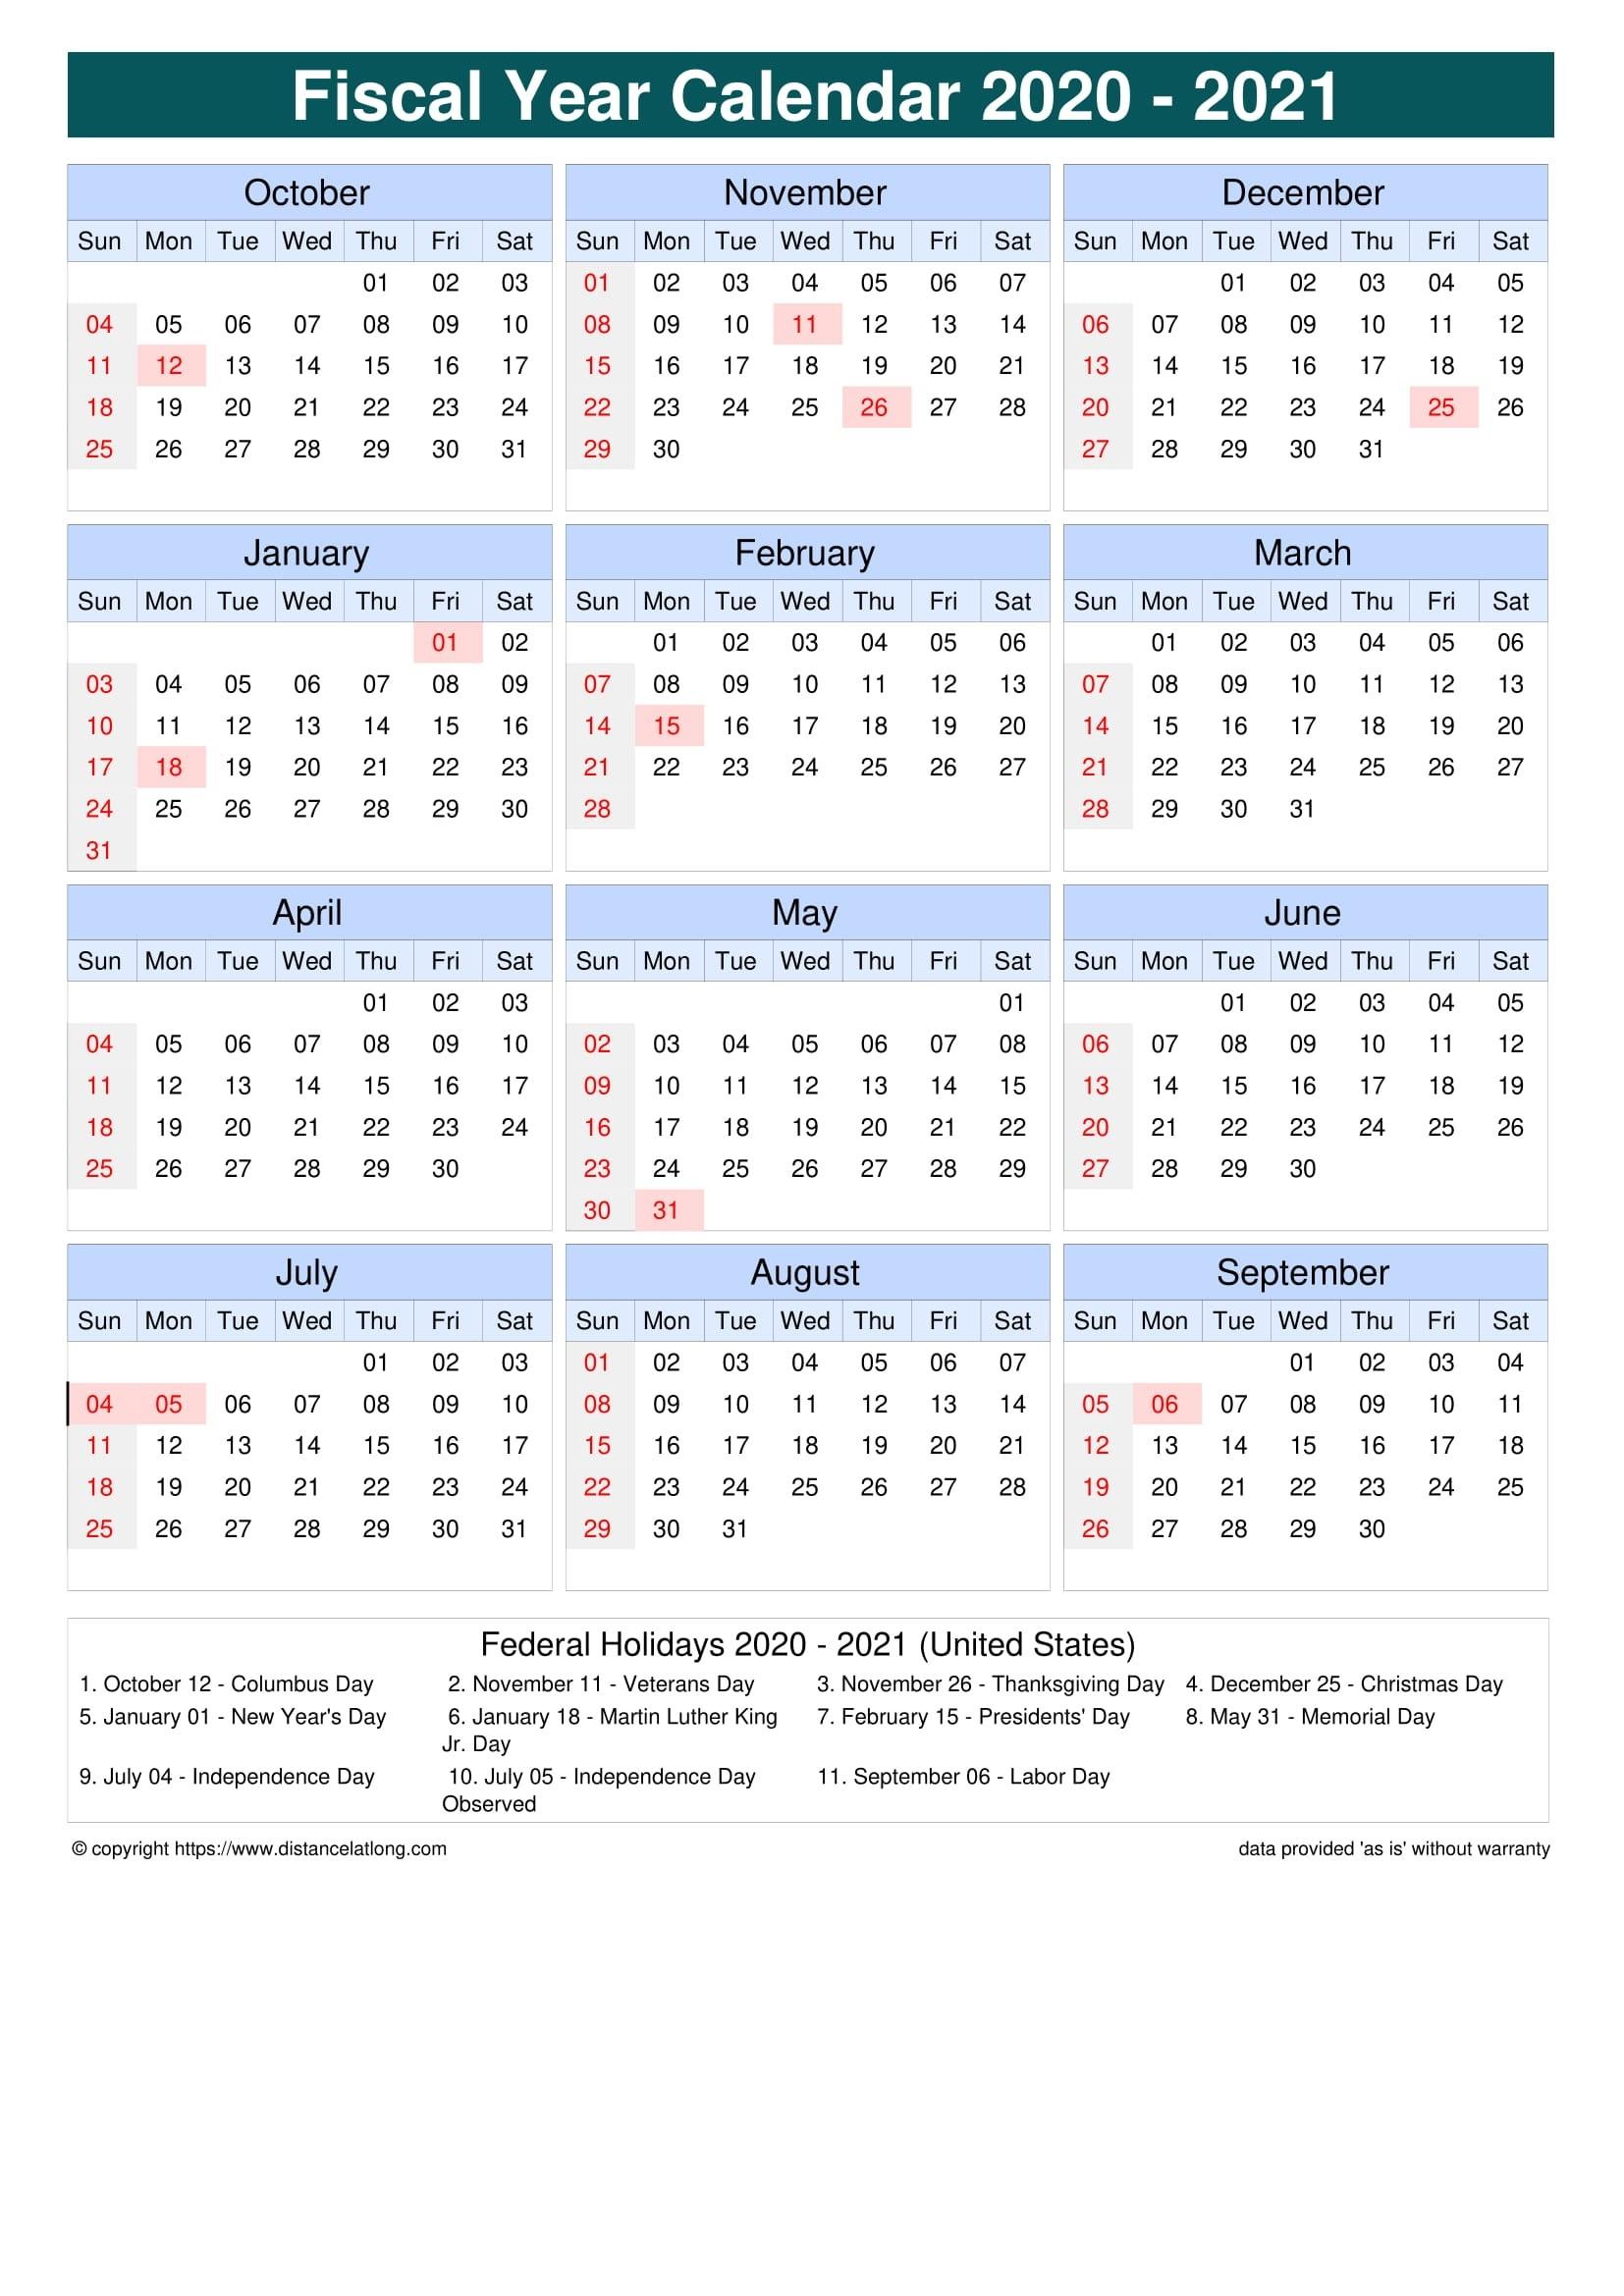 Fiscal Year 2020-2021 Calendar Templates, Free Printable  2021 2021 Financial Calendar Australia